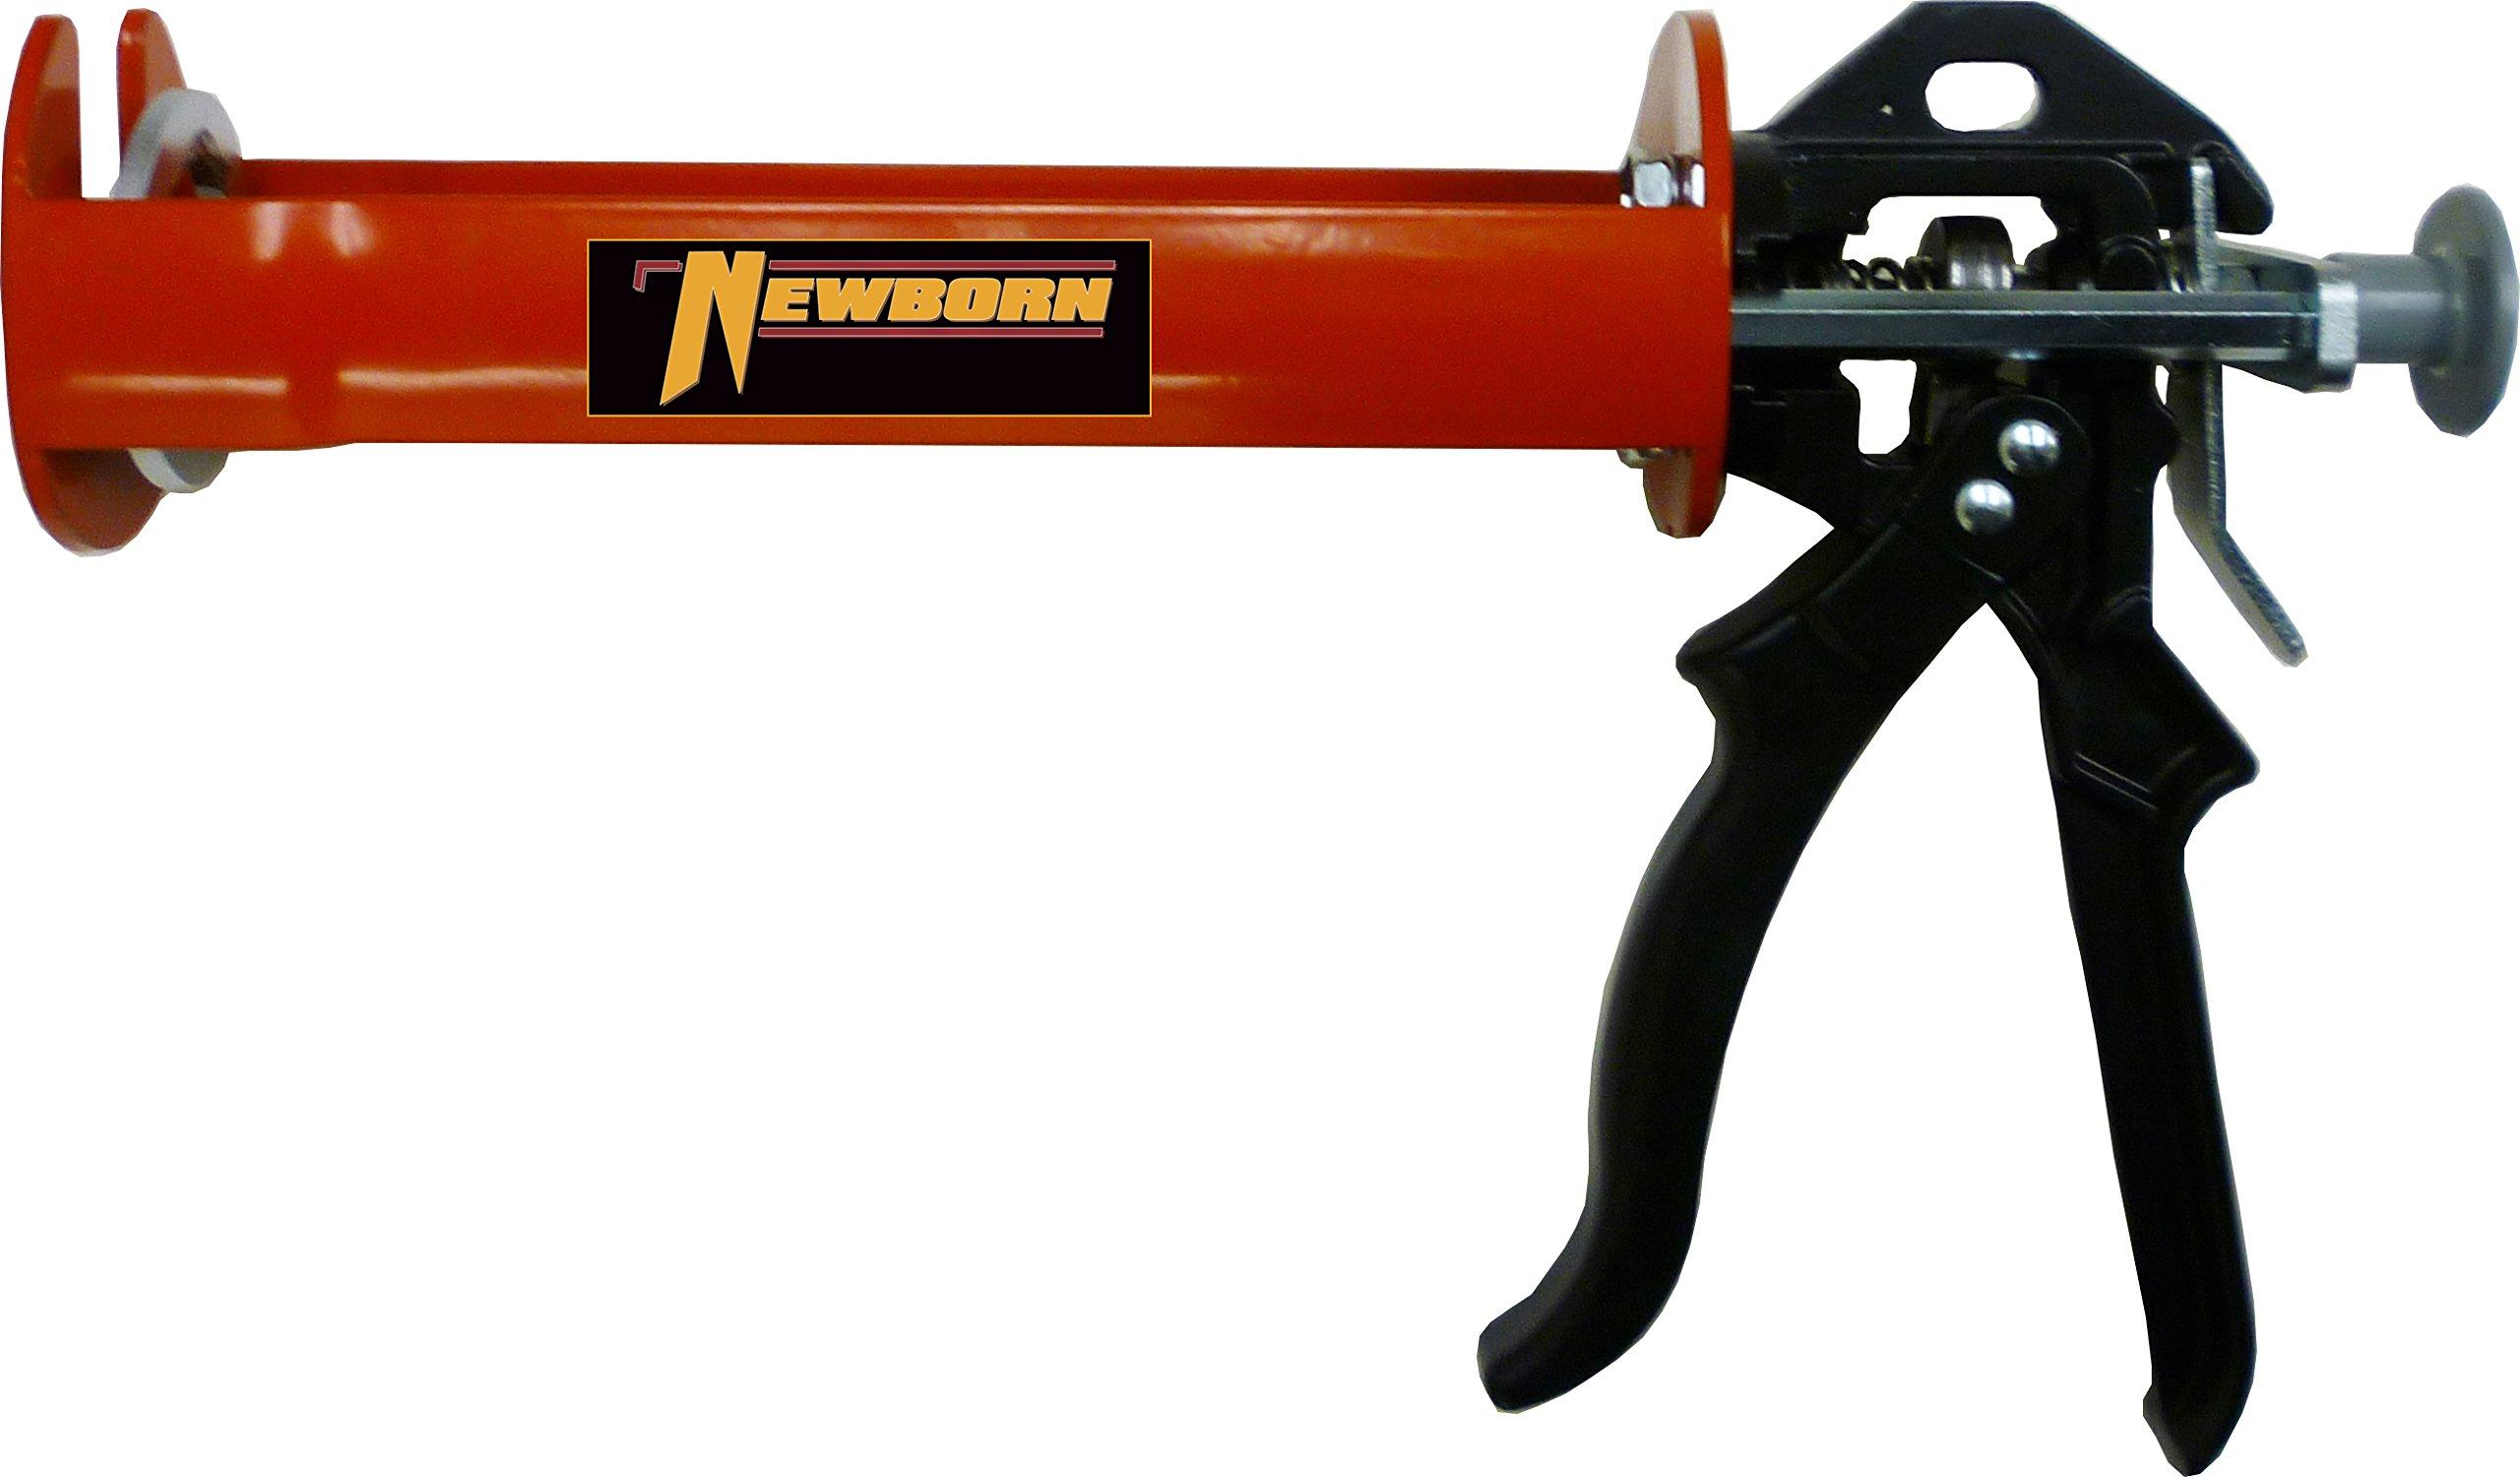 Newborn 385 Coaxial 5:1 Mix Ratio Gun, Used with 3M FIP, 1-Step Firestop Foam